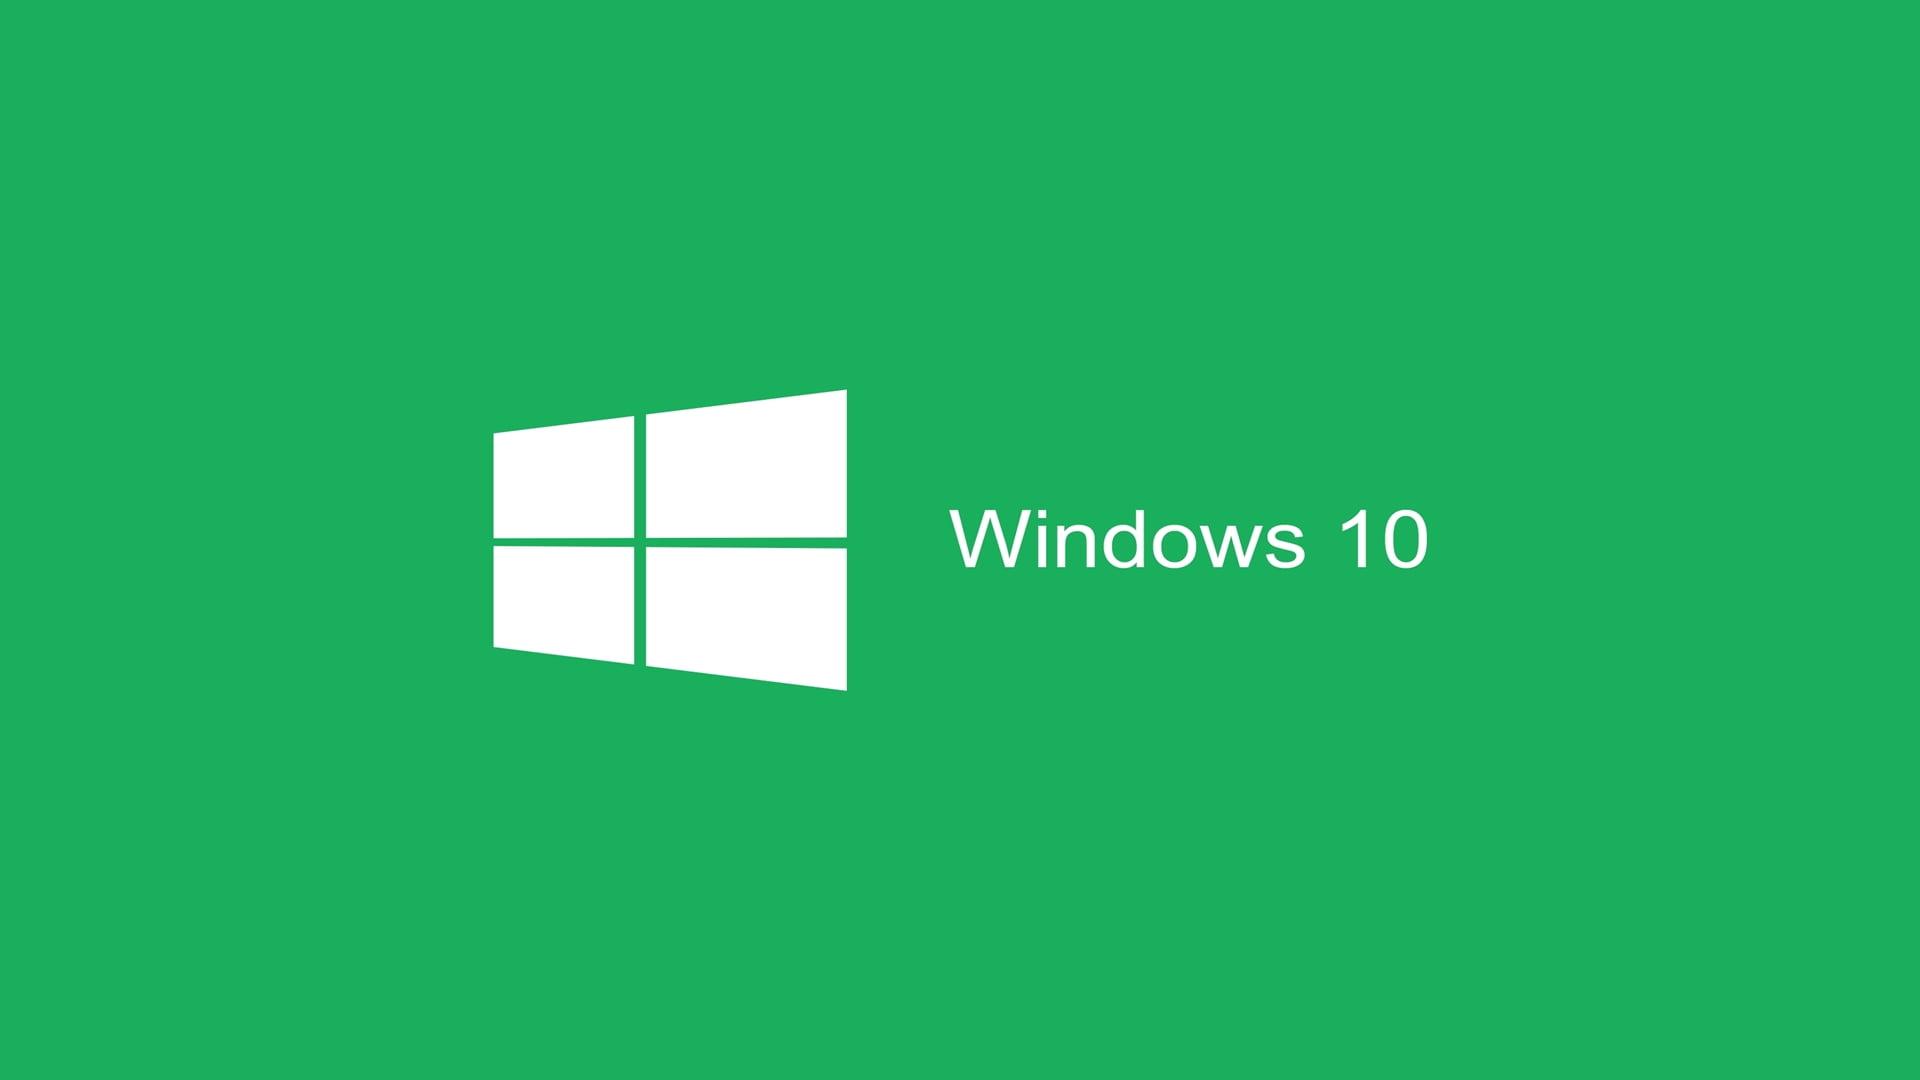 Papéis de parede do Windows 10 5